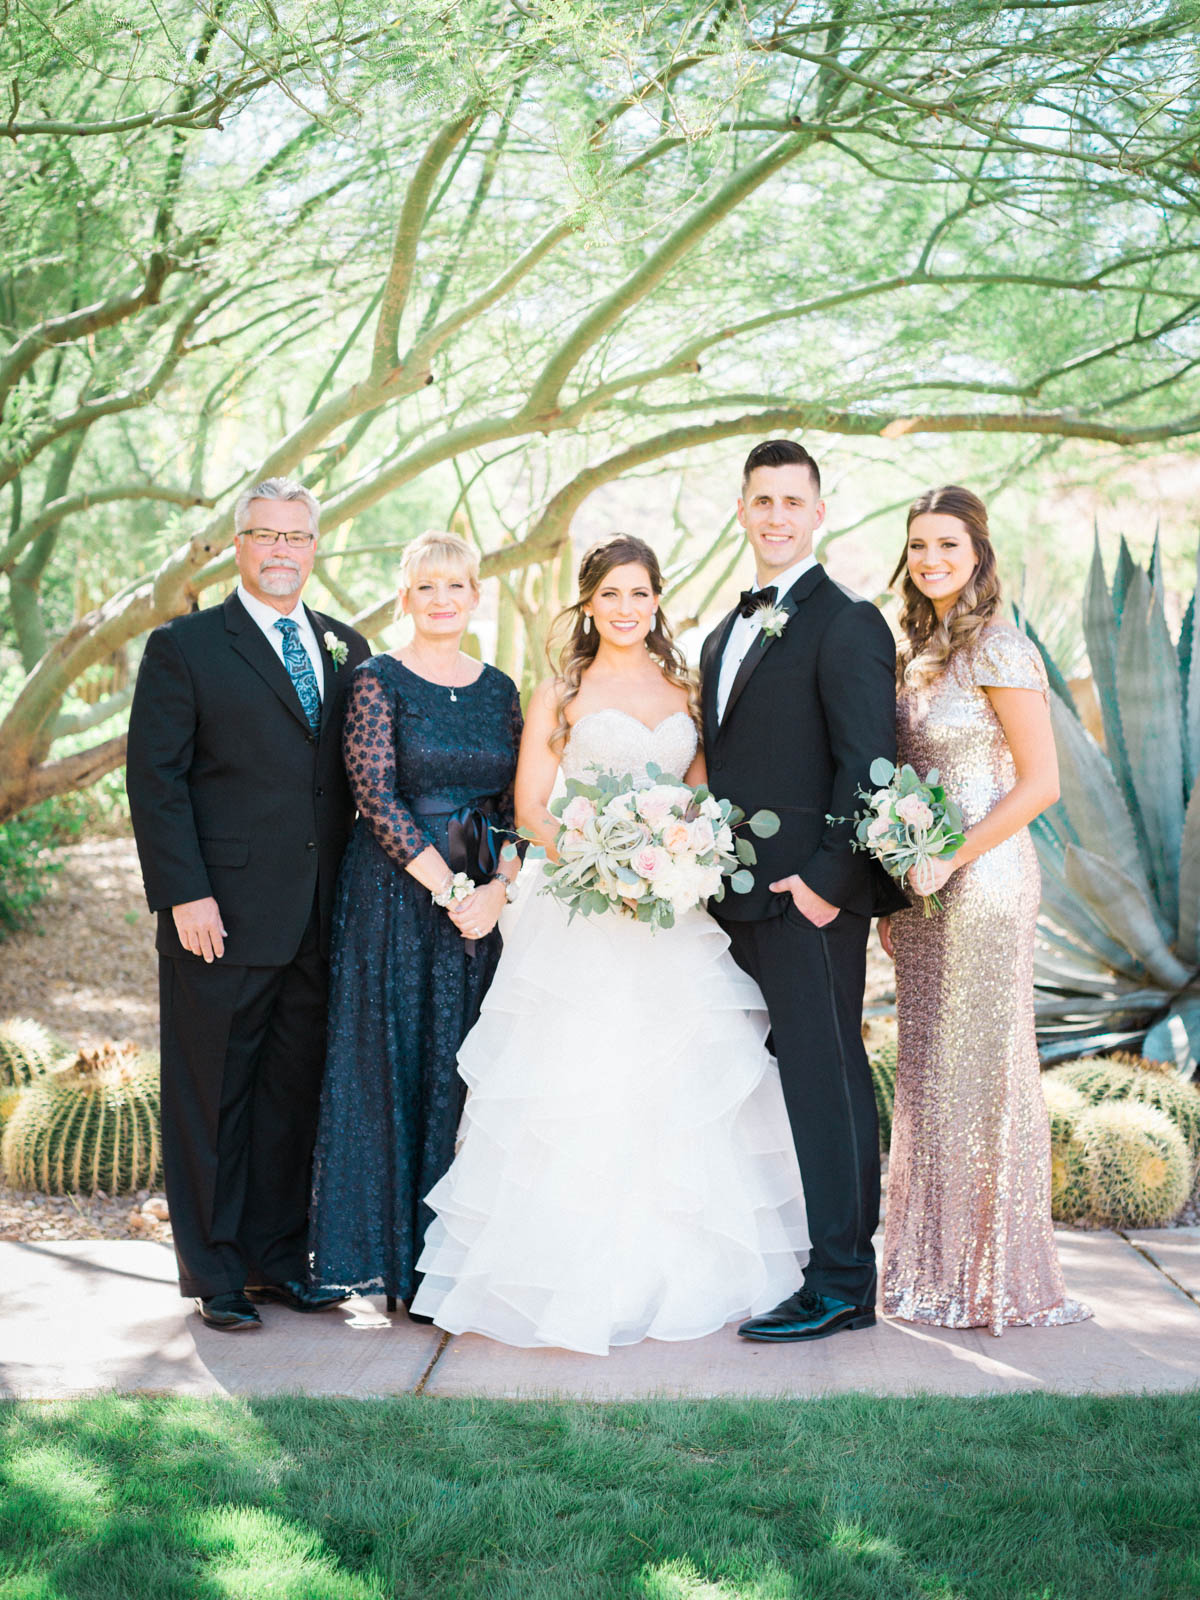 Family Photos captured by Tucson Wedding Photographers Betsy & John